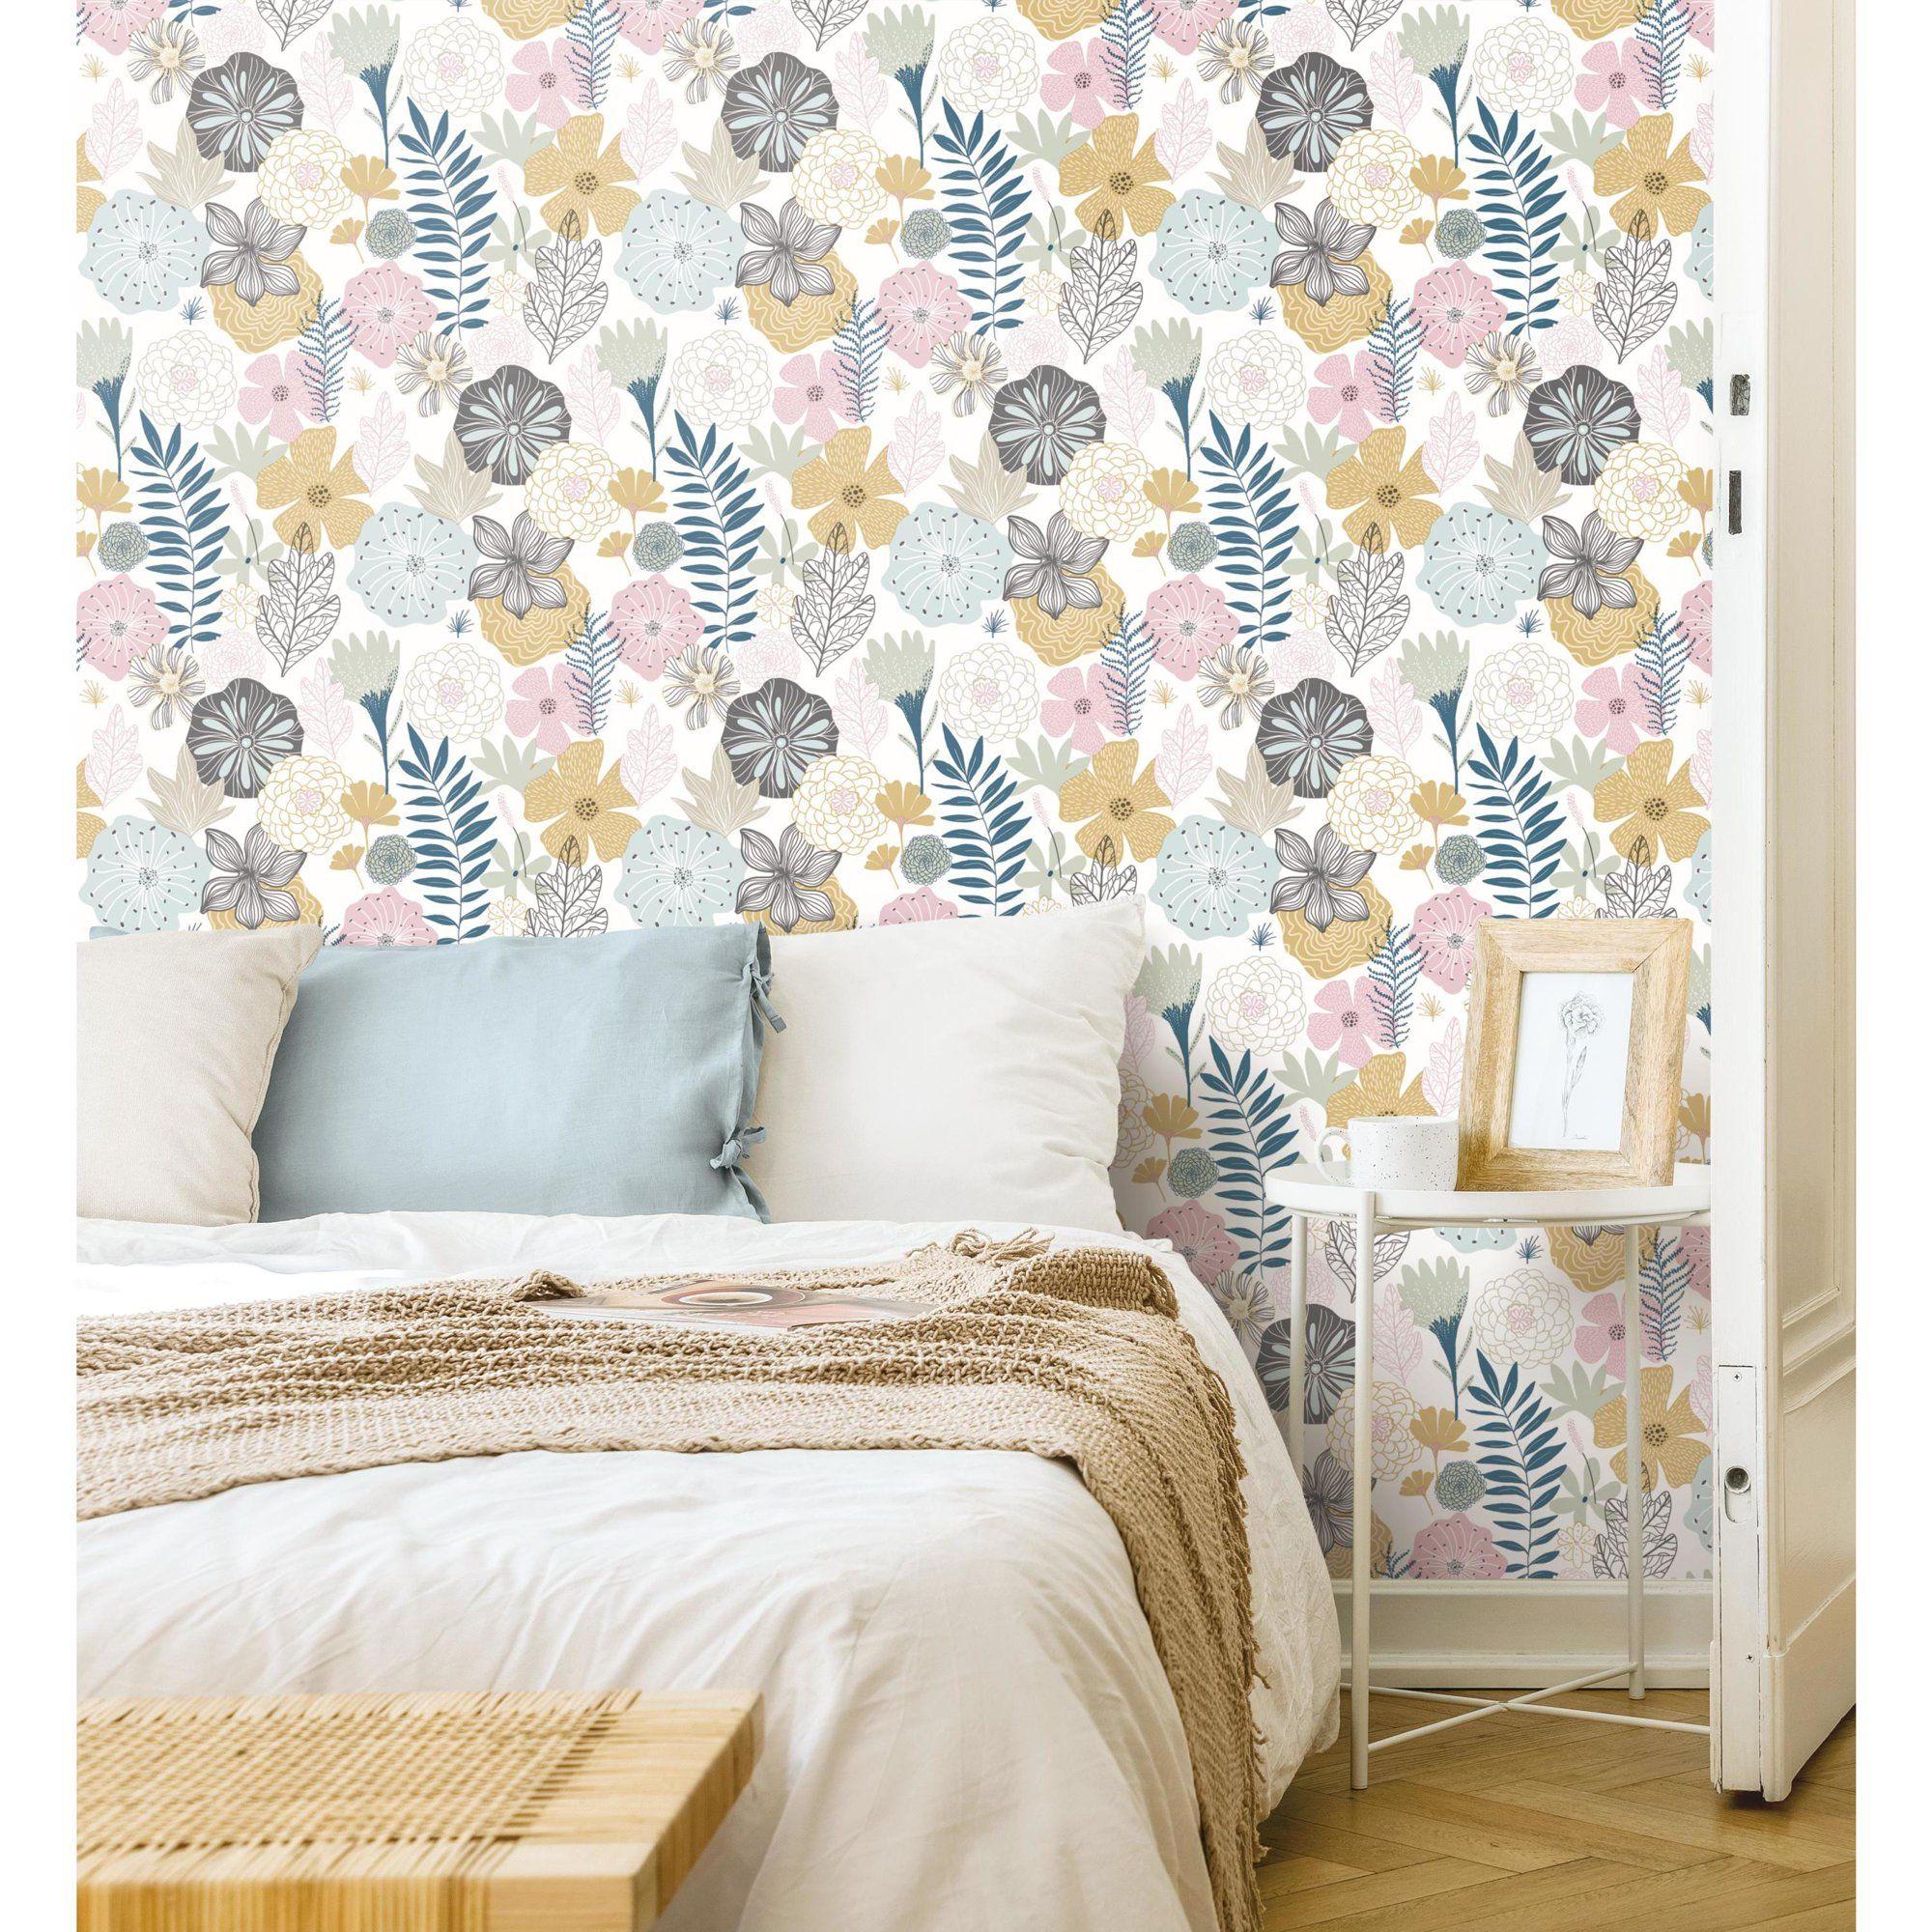 Roommates Perennial Blooms Peel And Stick Wallpaper Walmart Com Home Decor Peel And Stick Wallpaper Decor